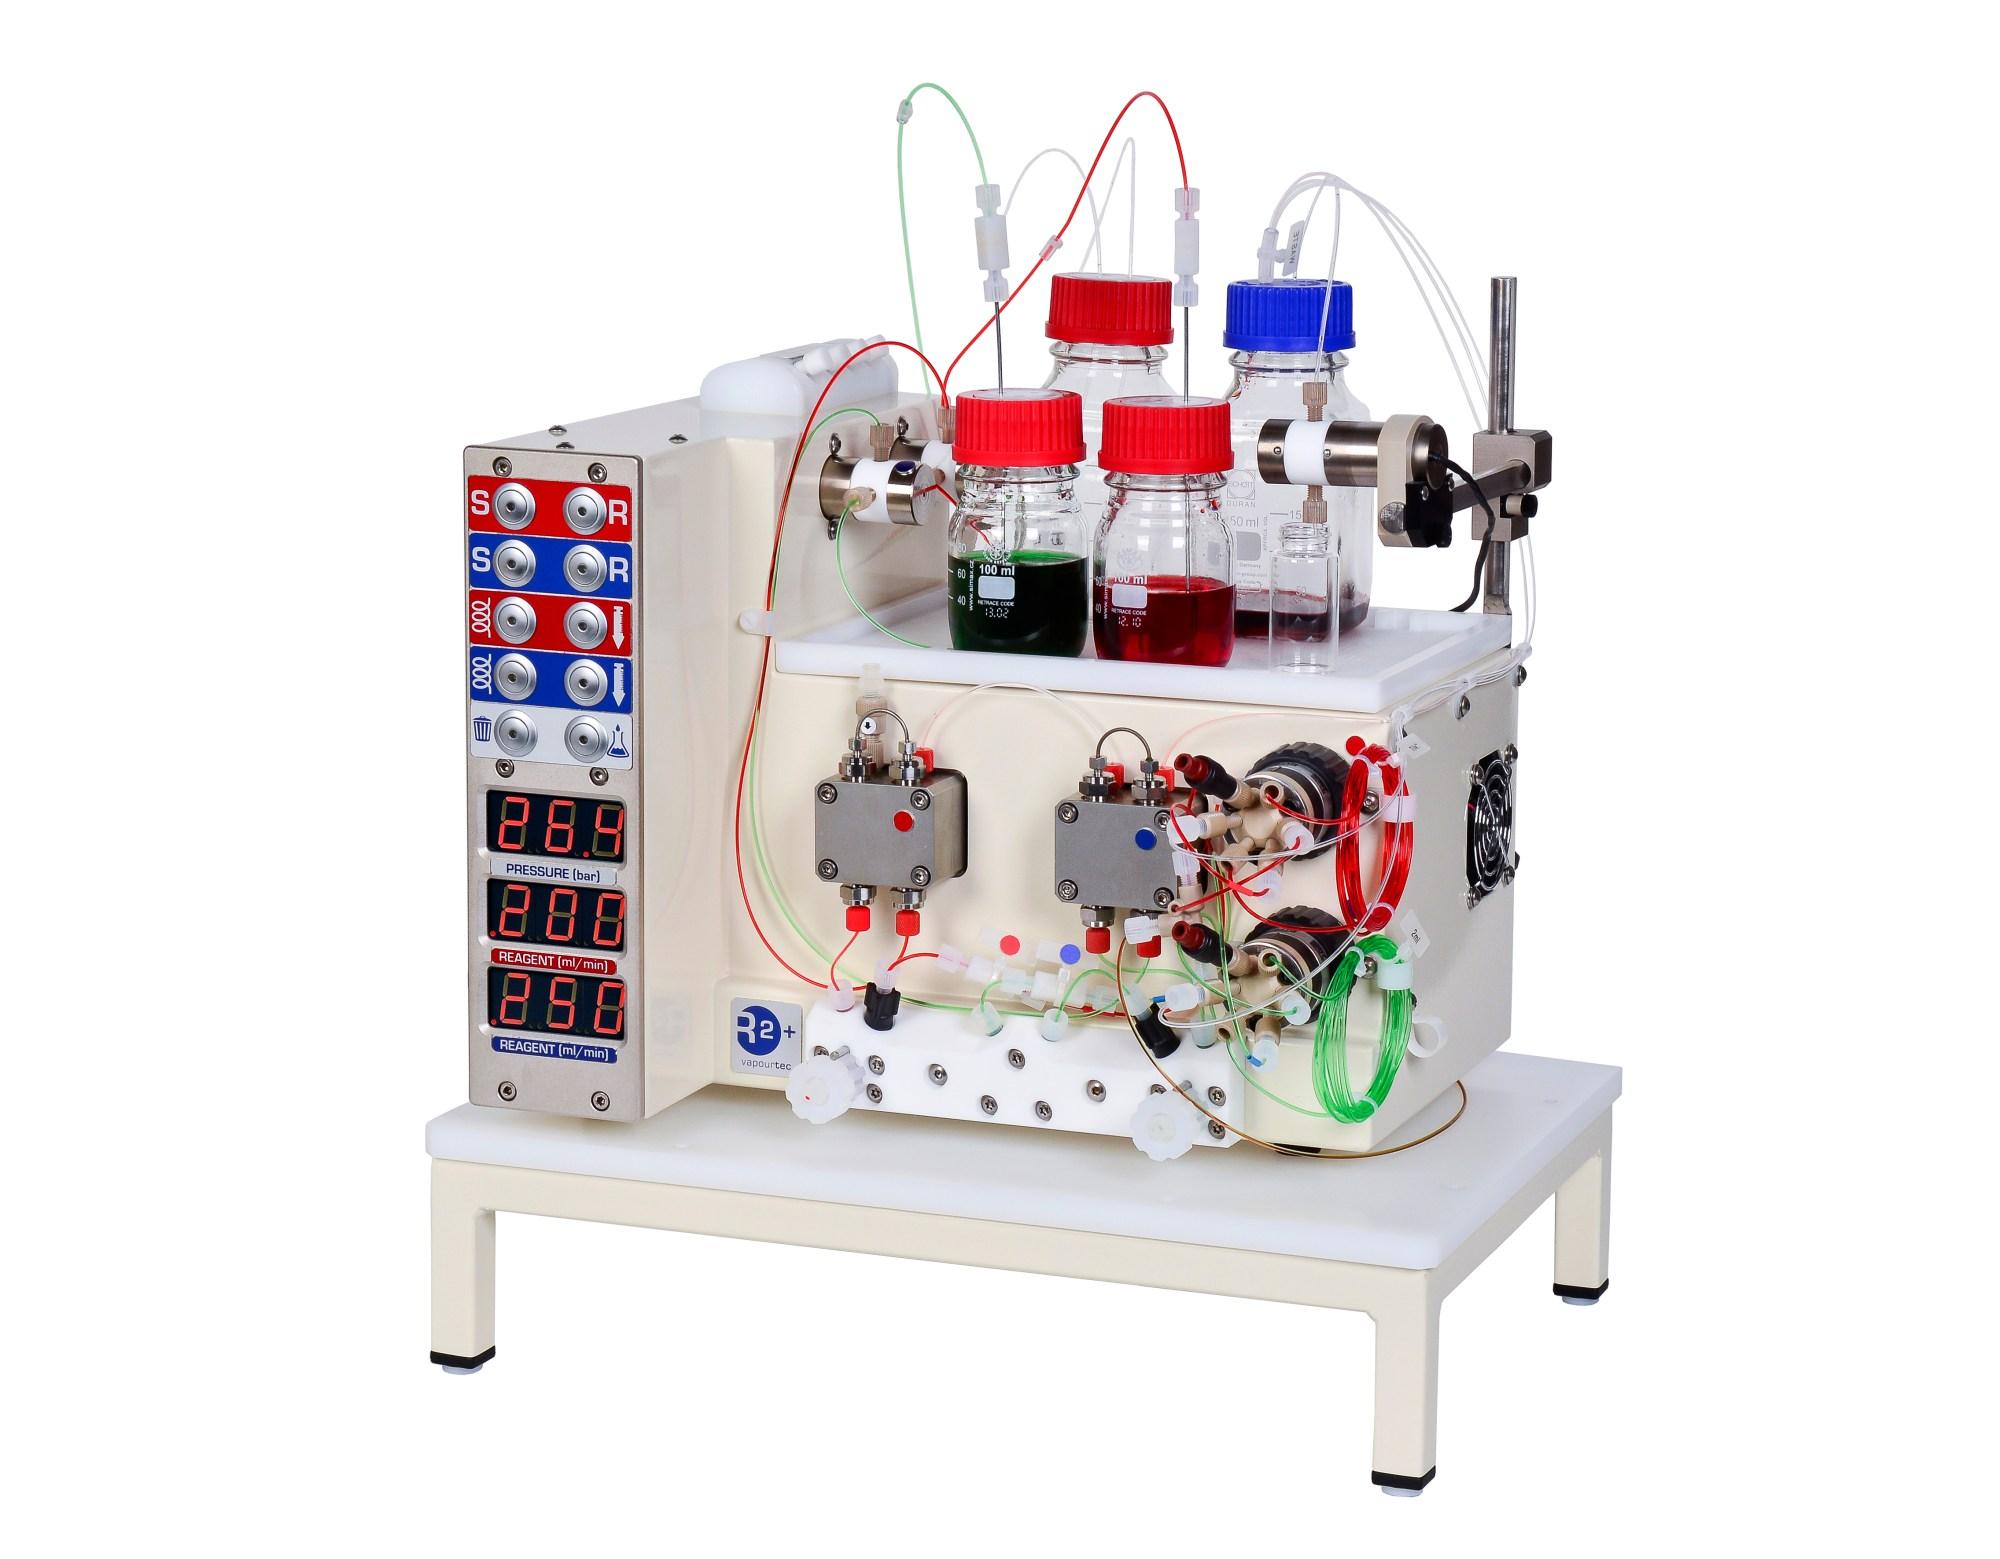 hight resolution of r2 single flow chemistry pump module